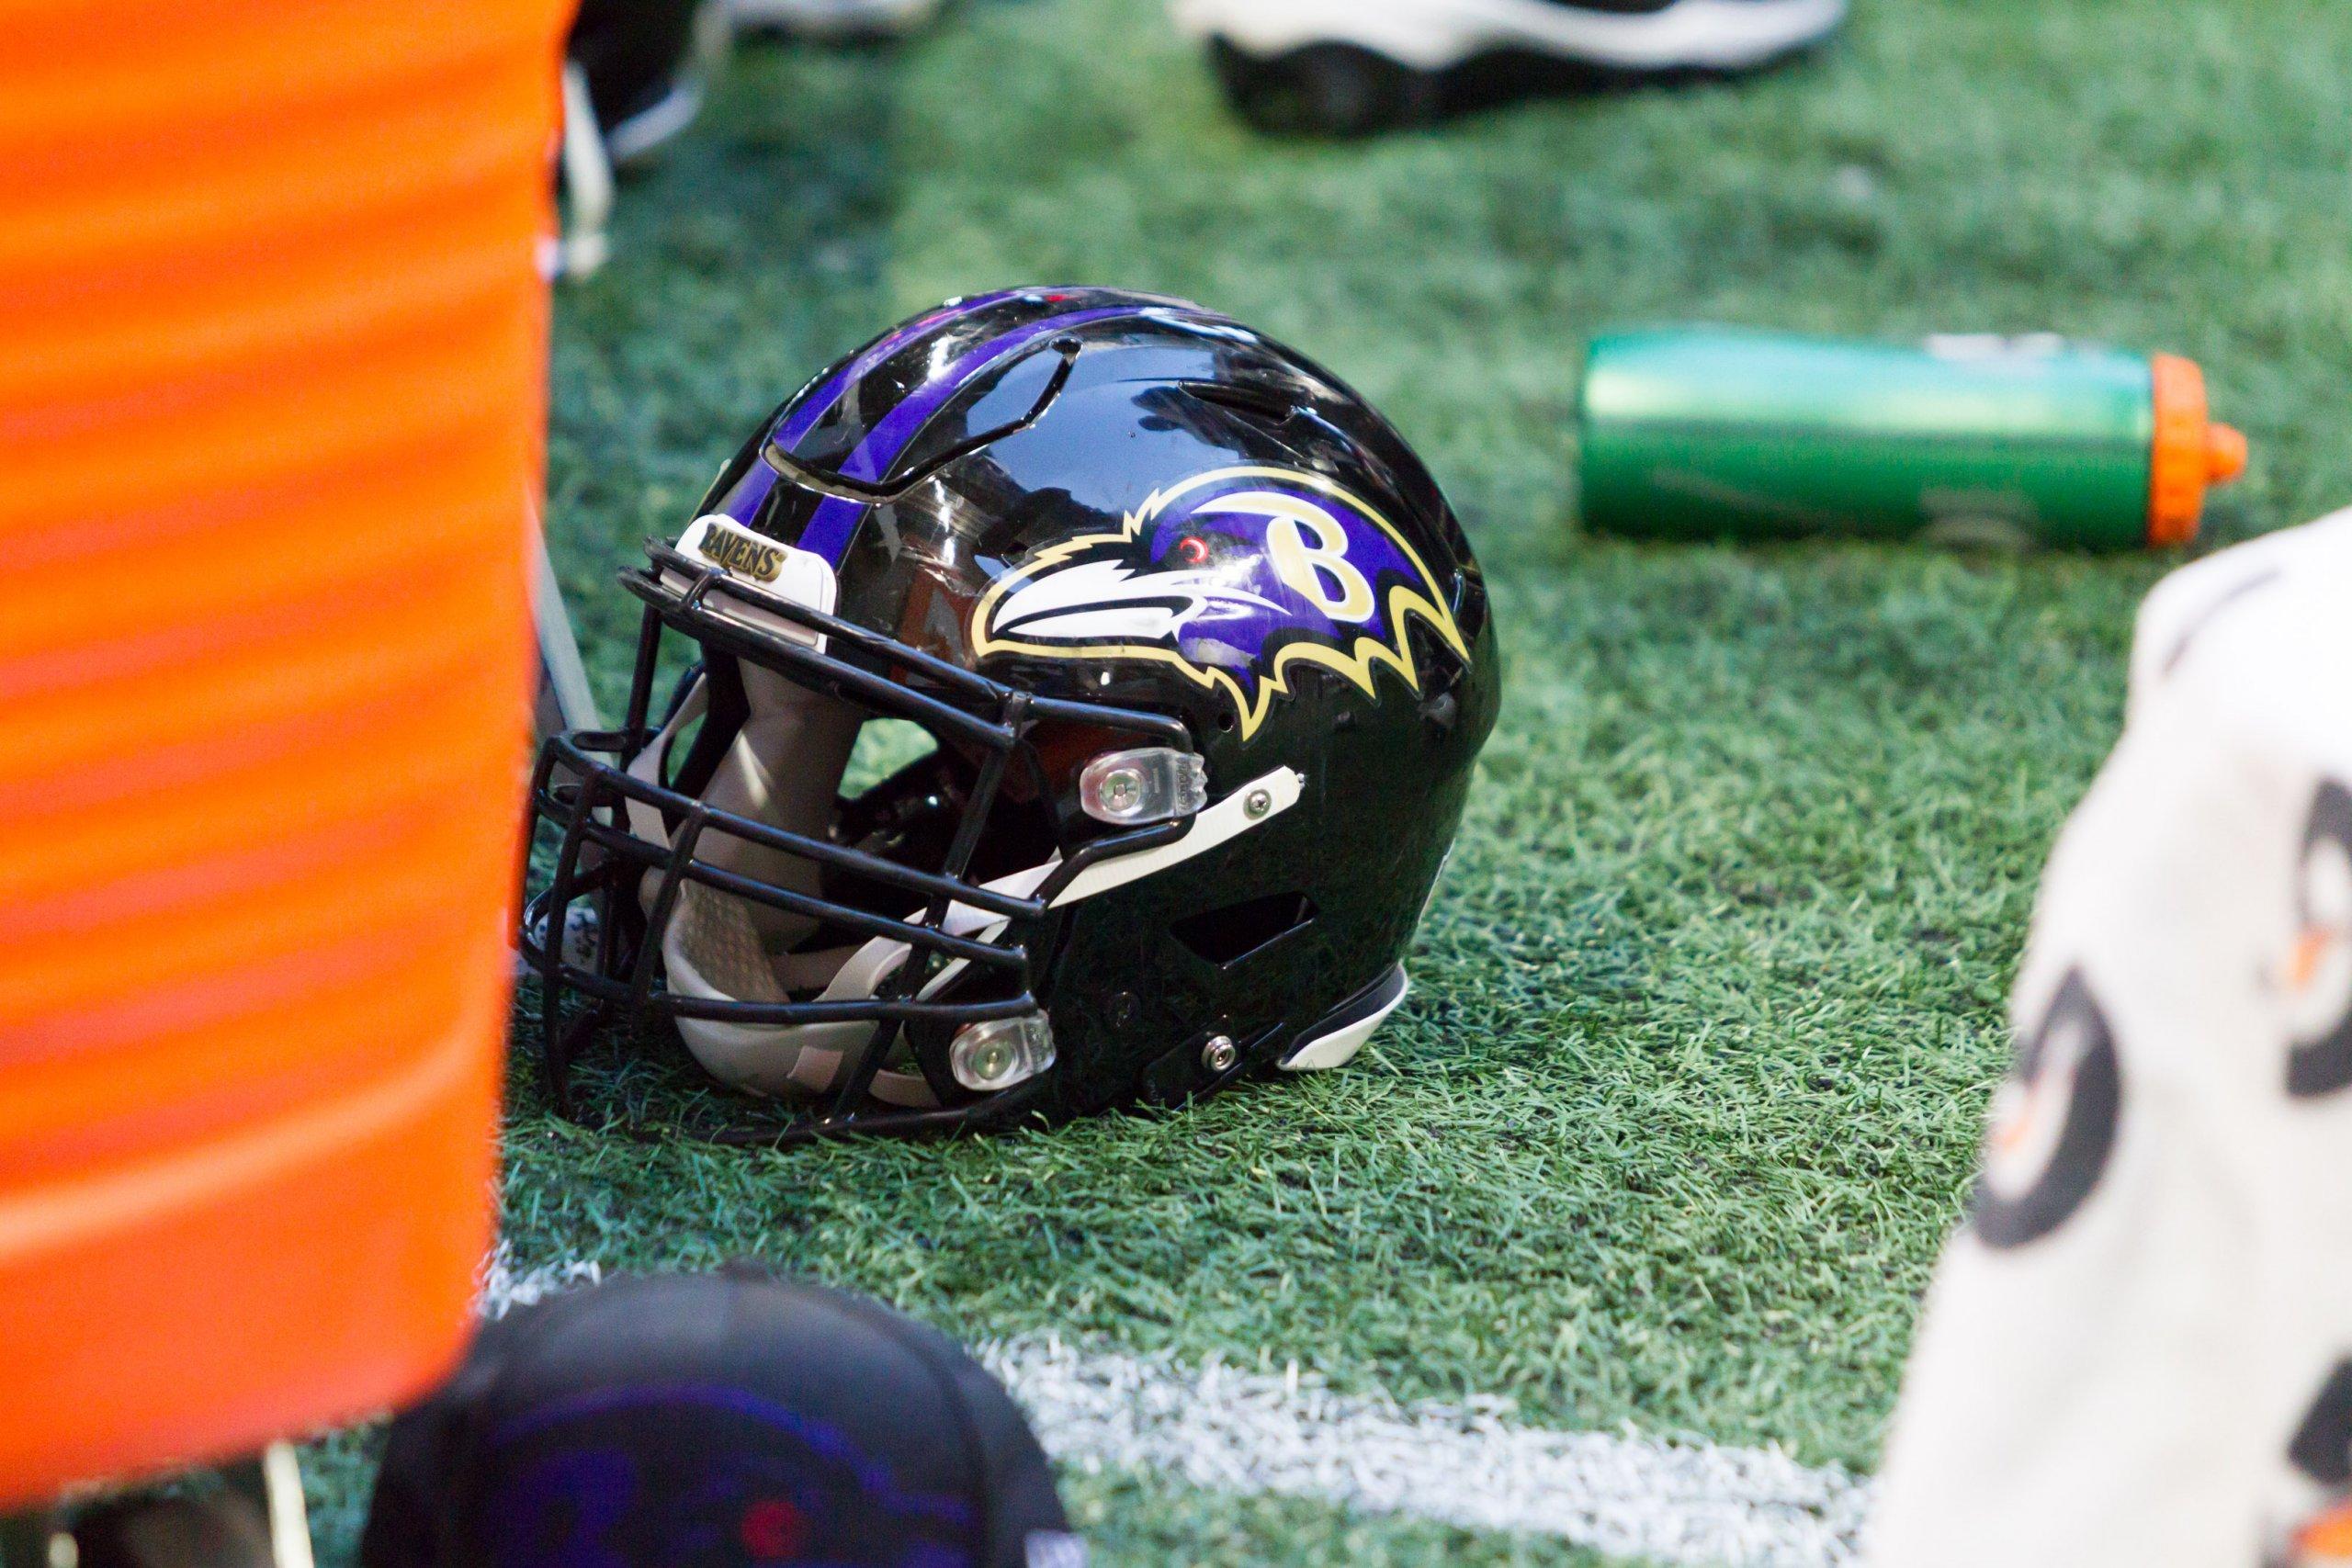 Baltimore Ravens helmet and pylon Dec 2, 2018, Atlanta